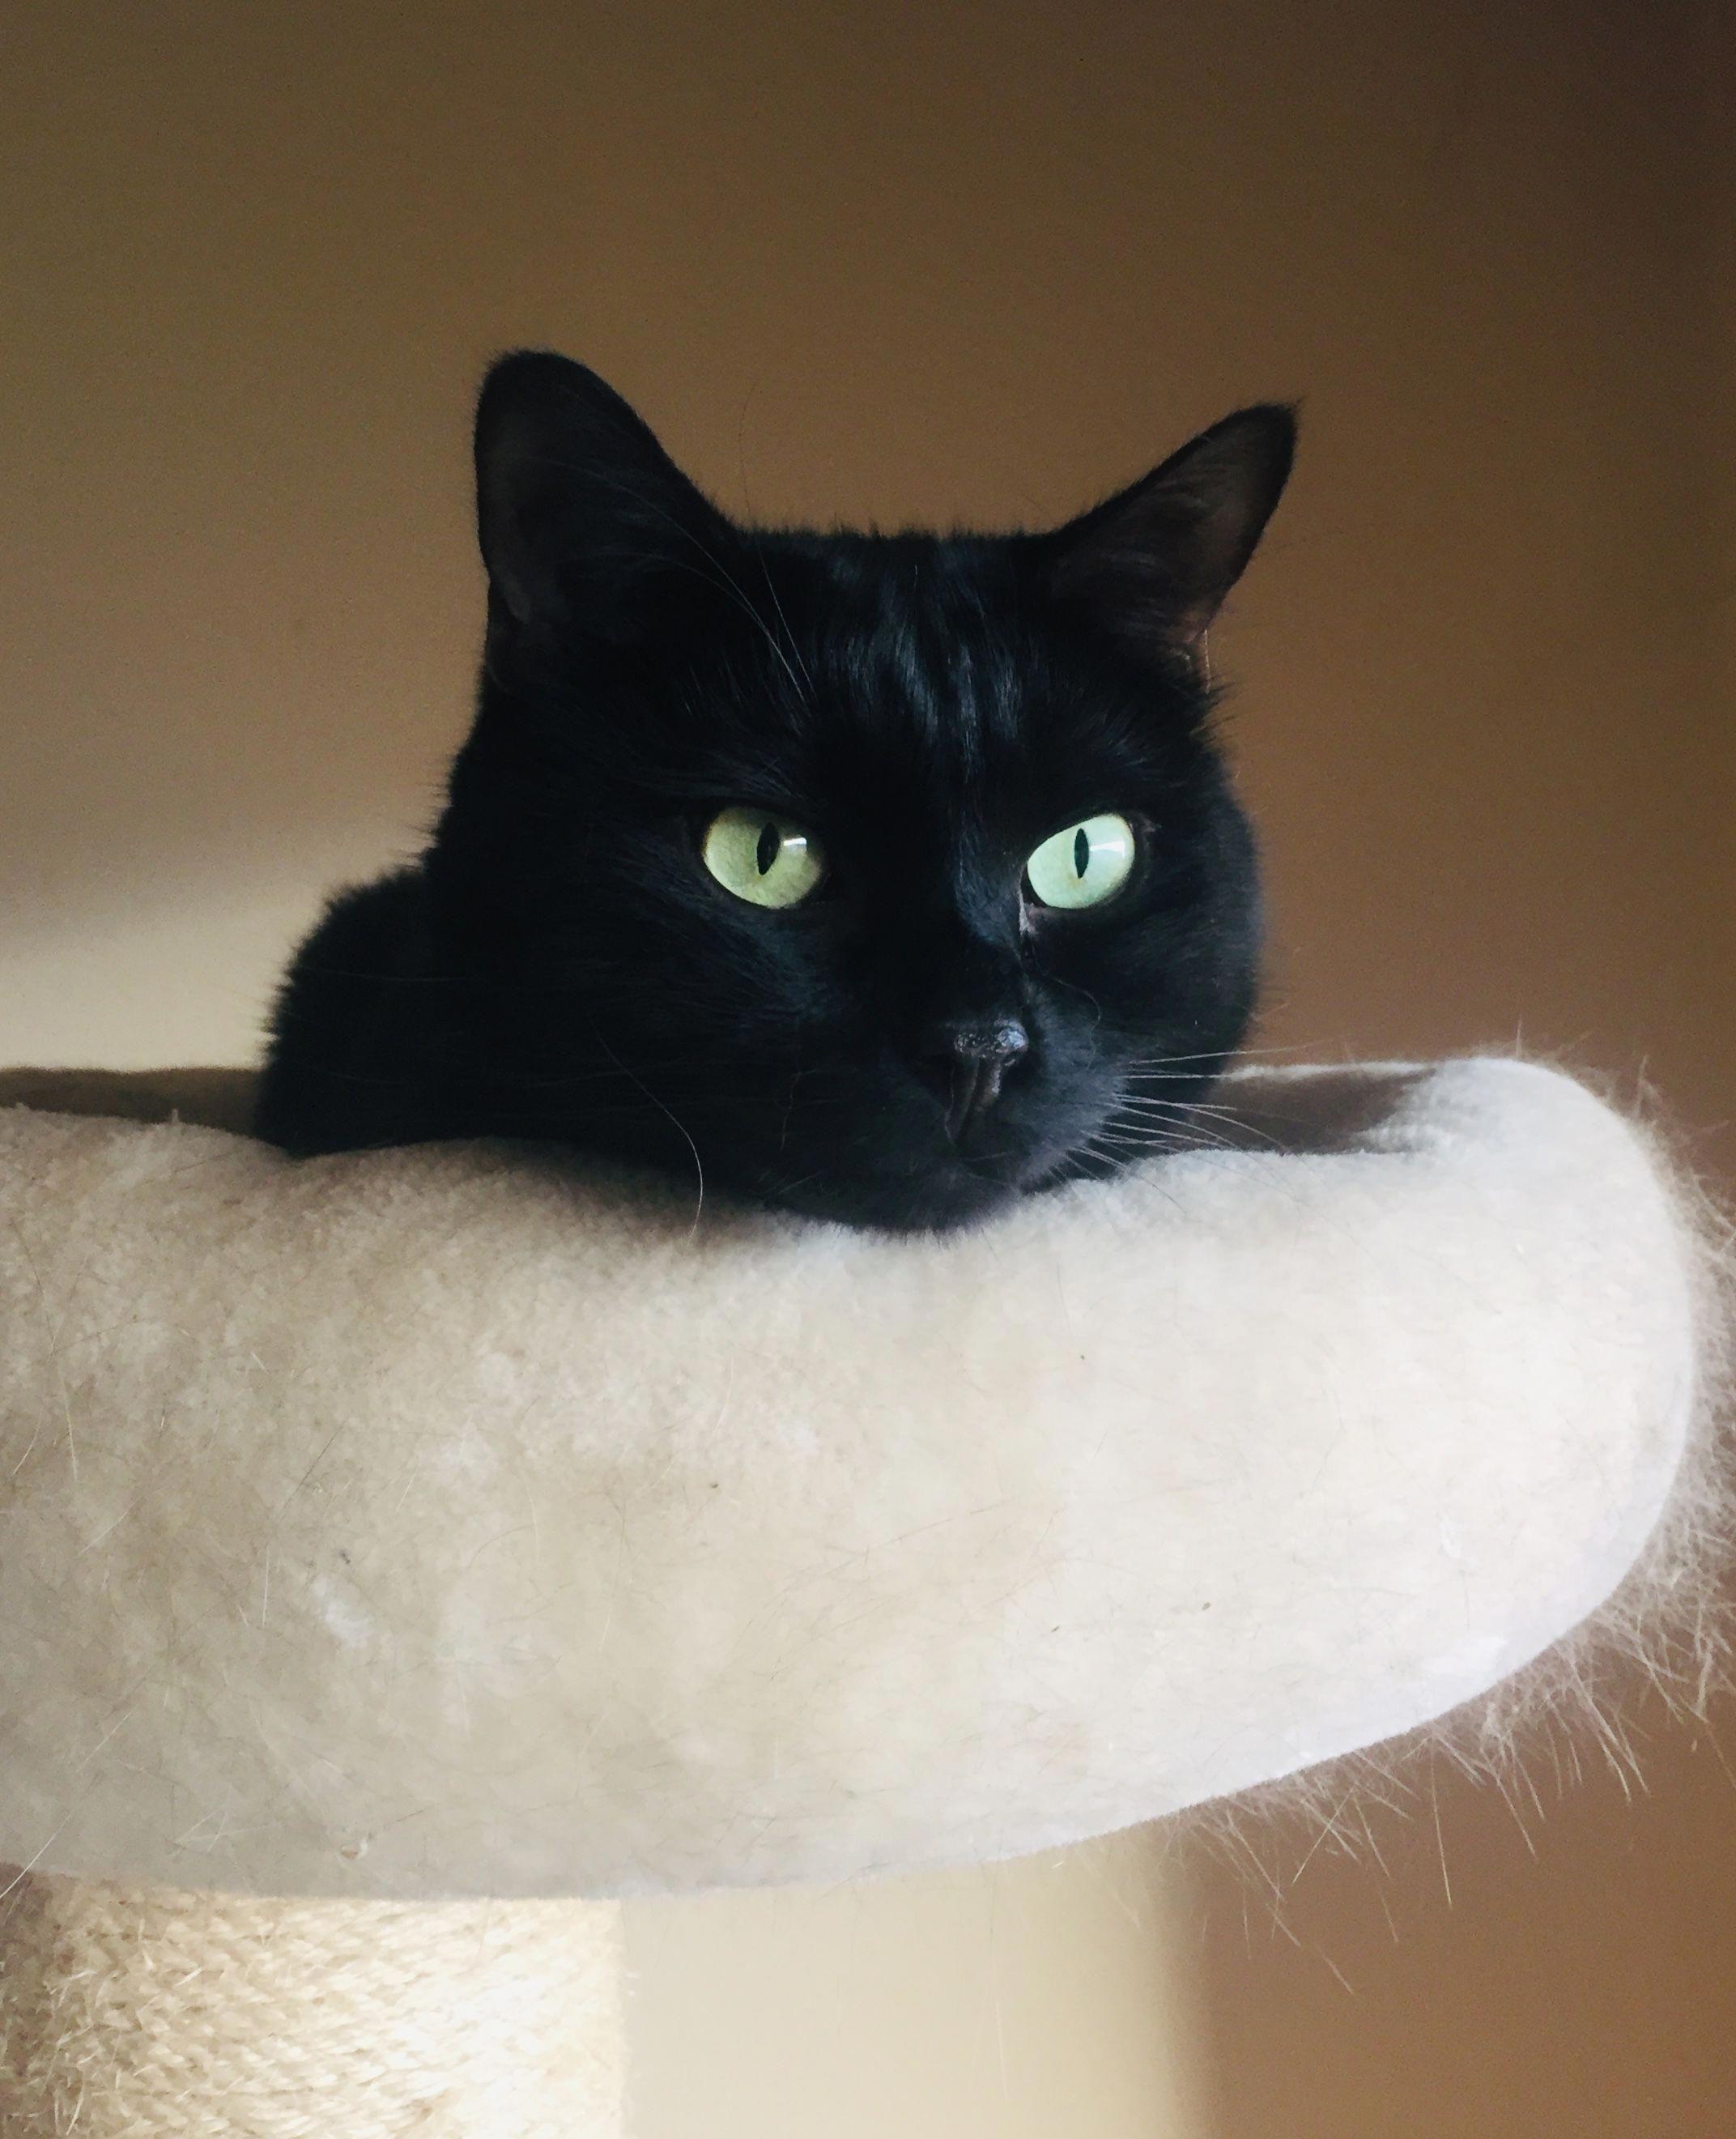 Black Cat Cat Cats Cats Catsaesthetic Cute Cats Black Cat Cat Love